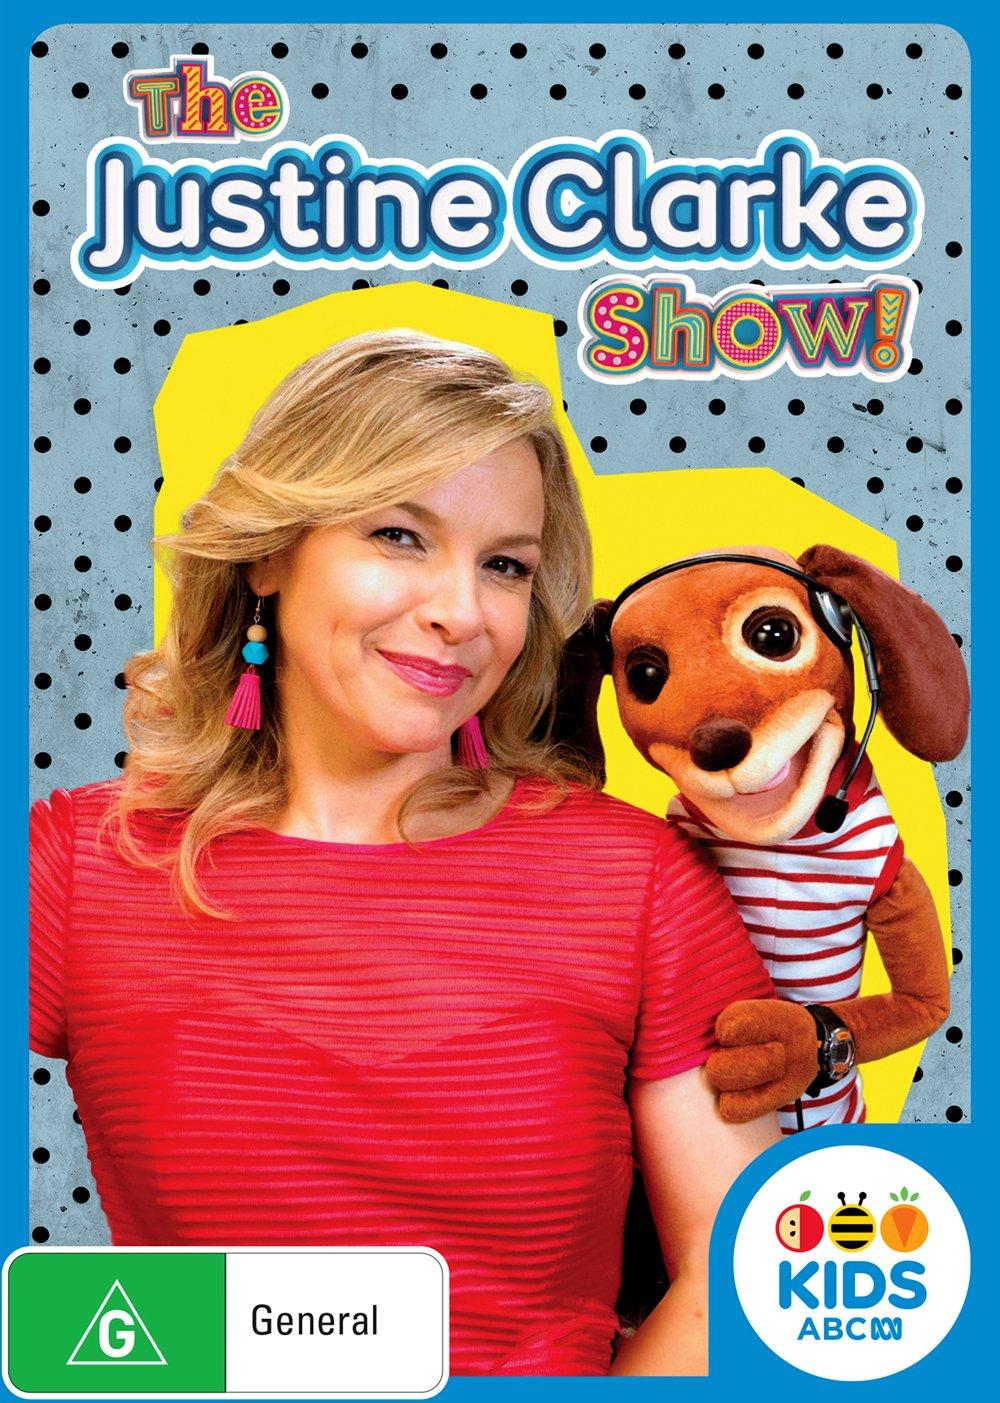 Justine Clarke Videography